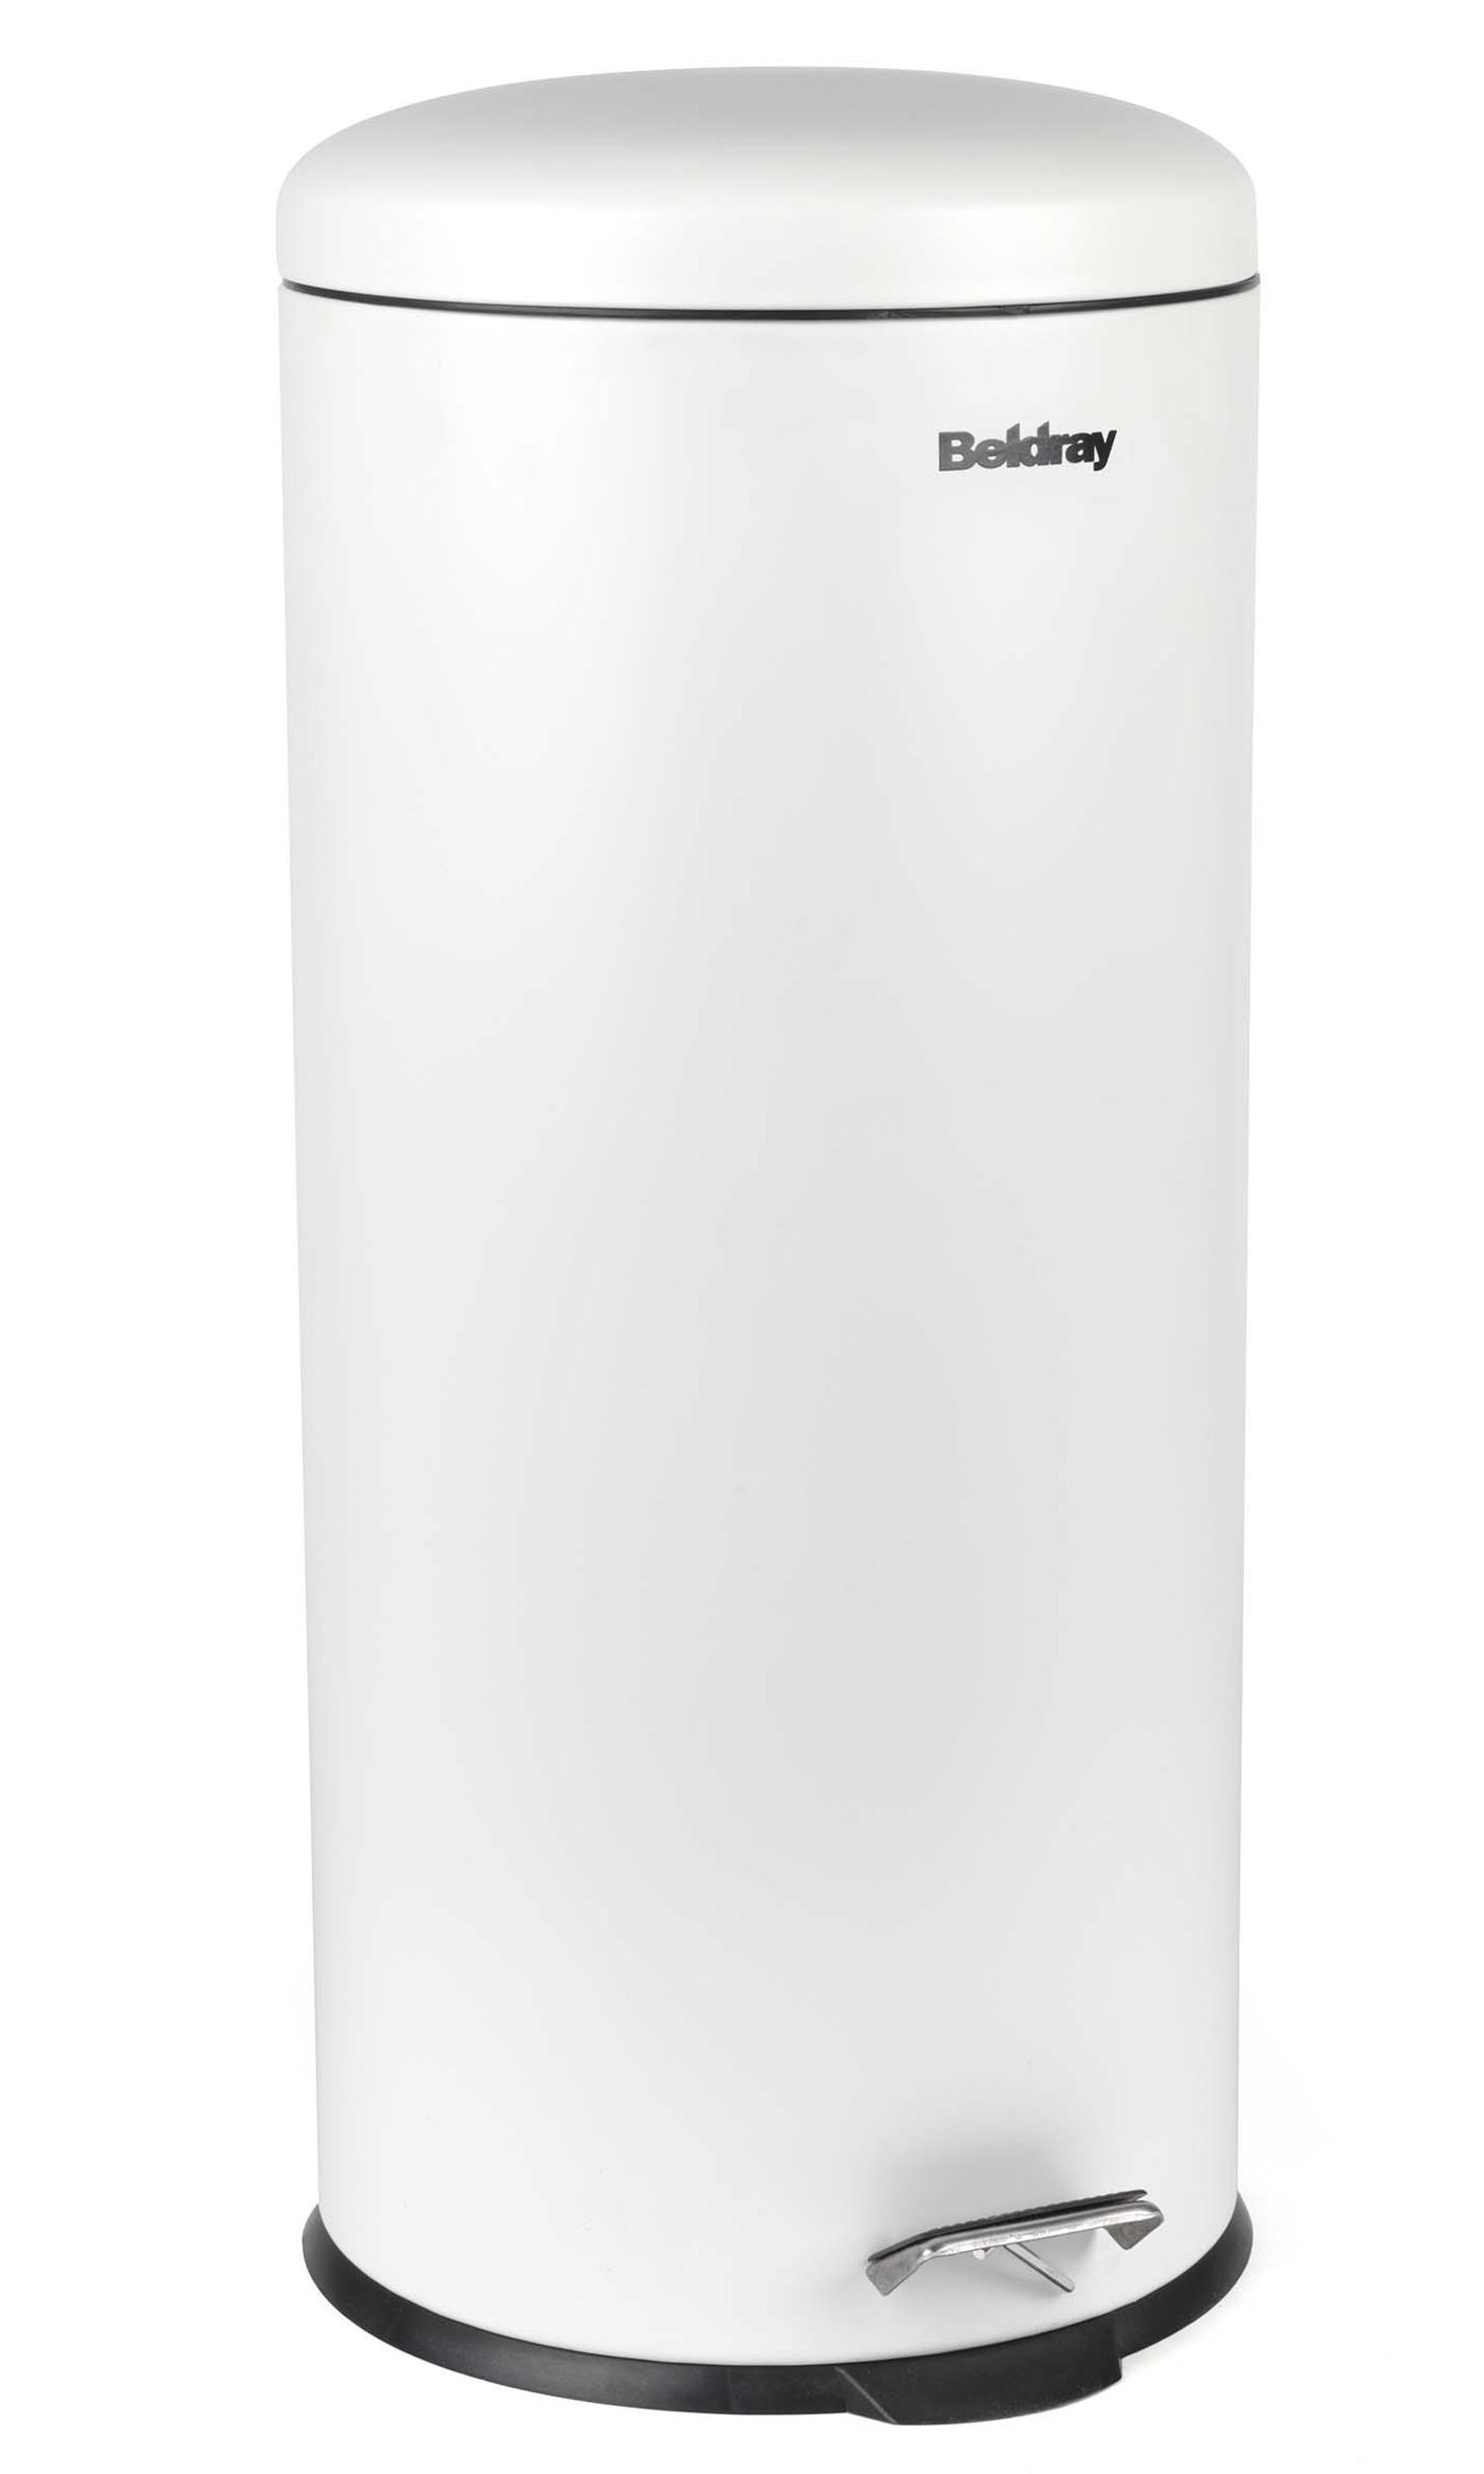 beldray la038074wht 30 litre white kitchen bin with soft. Black Bedroom Furniture Sets. Home Design Ideas